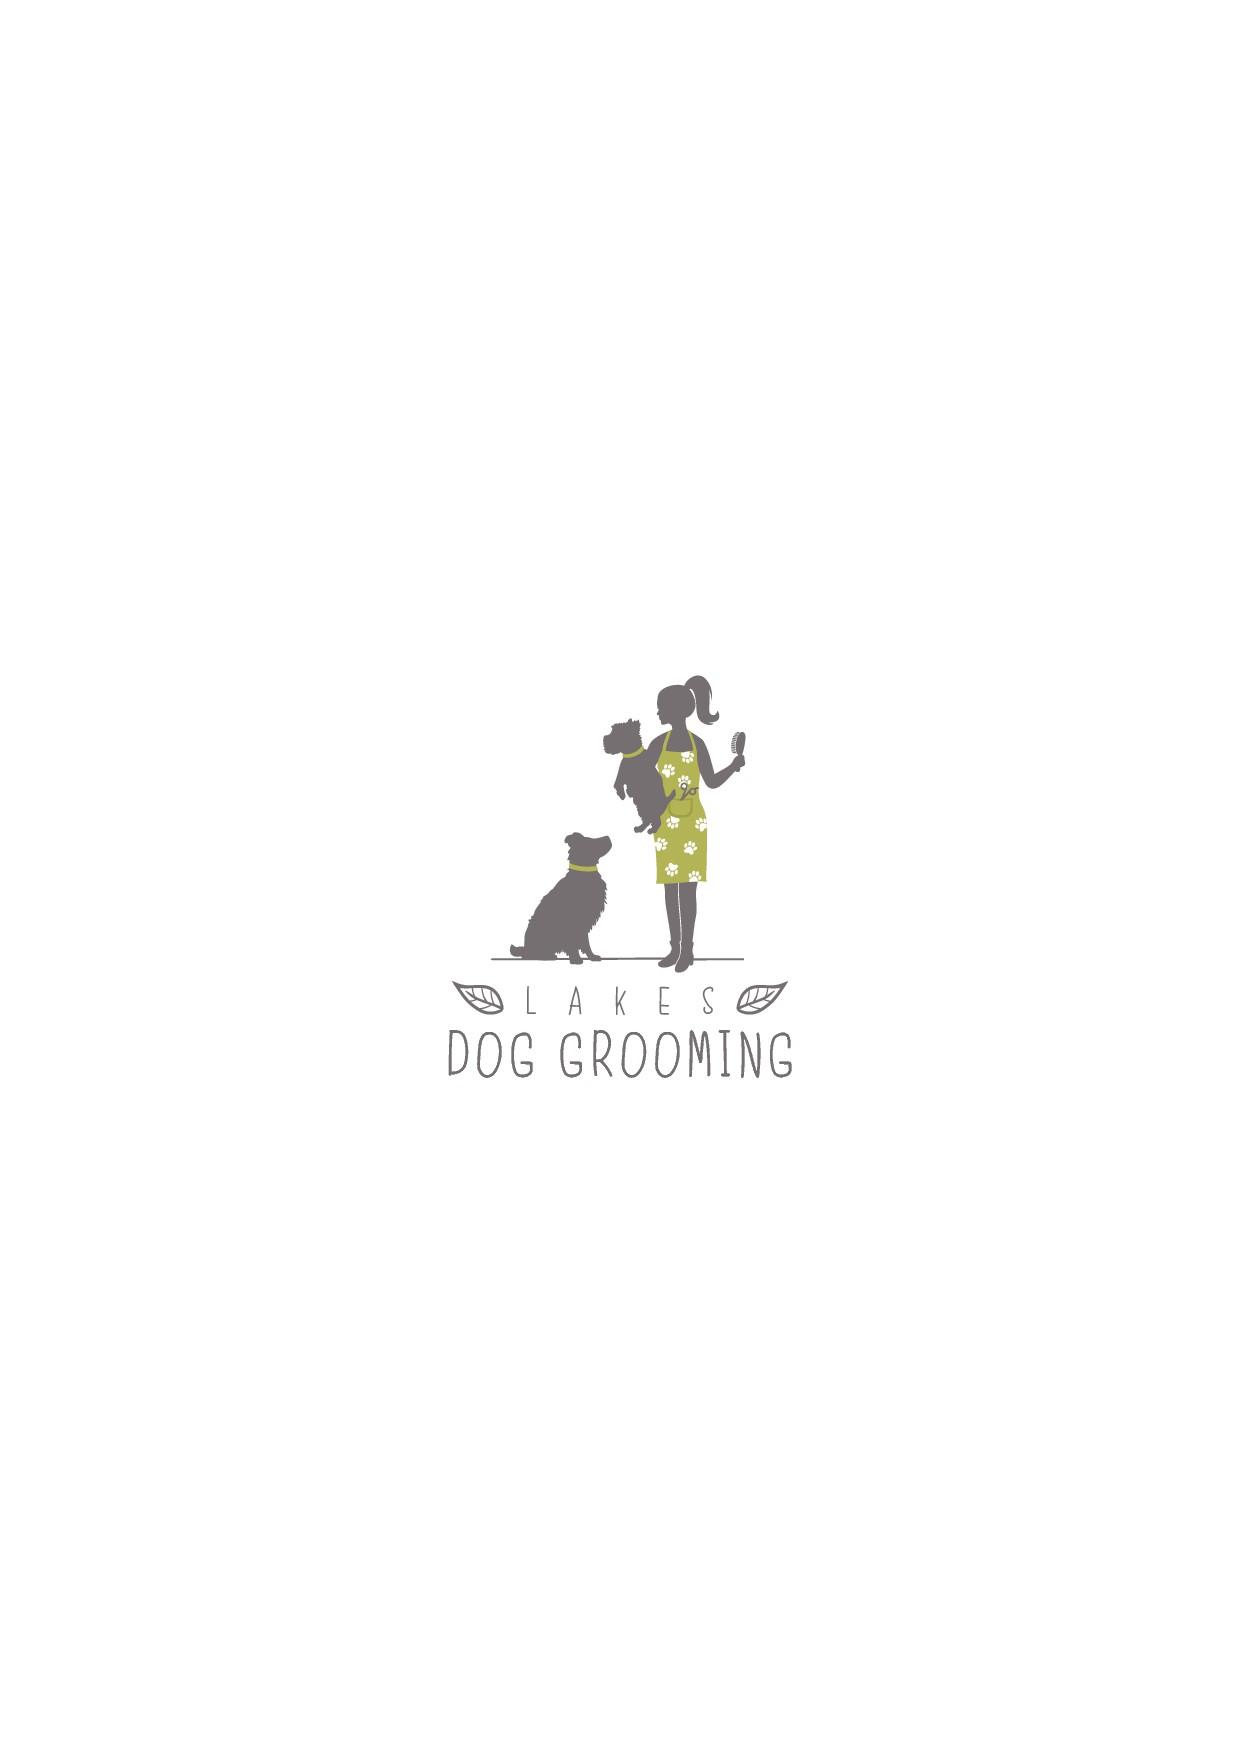 Lakes Dog Grooming needs a new logo!